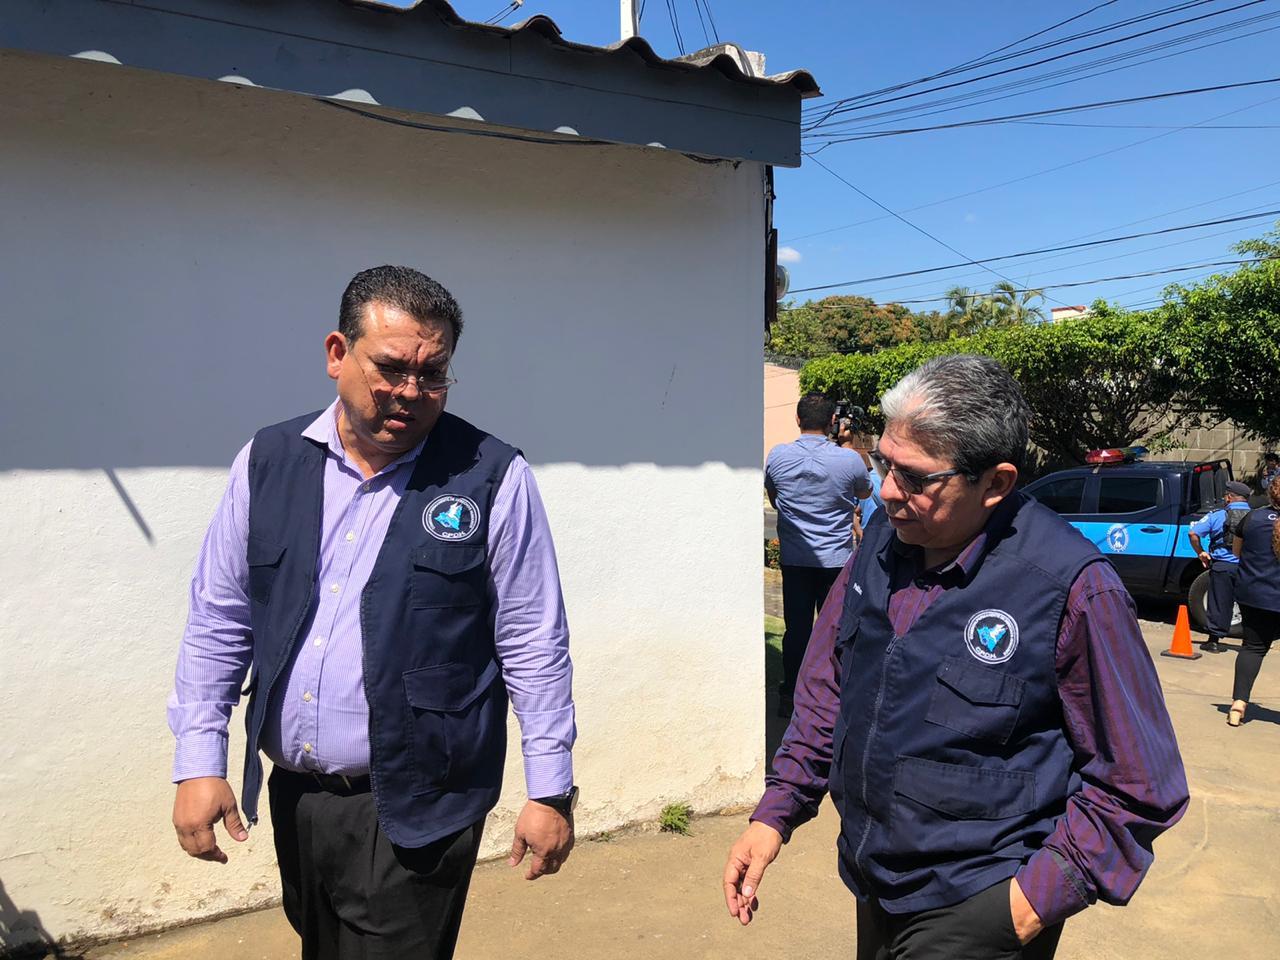 CPDH visita al comentarista Jaime Arellano tras cuatro días de cerco policial. Foto: Donaldo Hernández/VOA